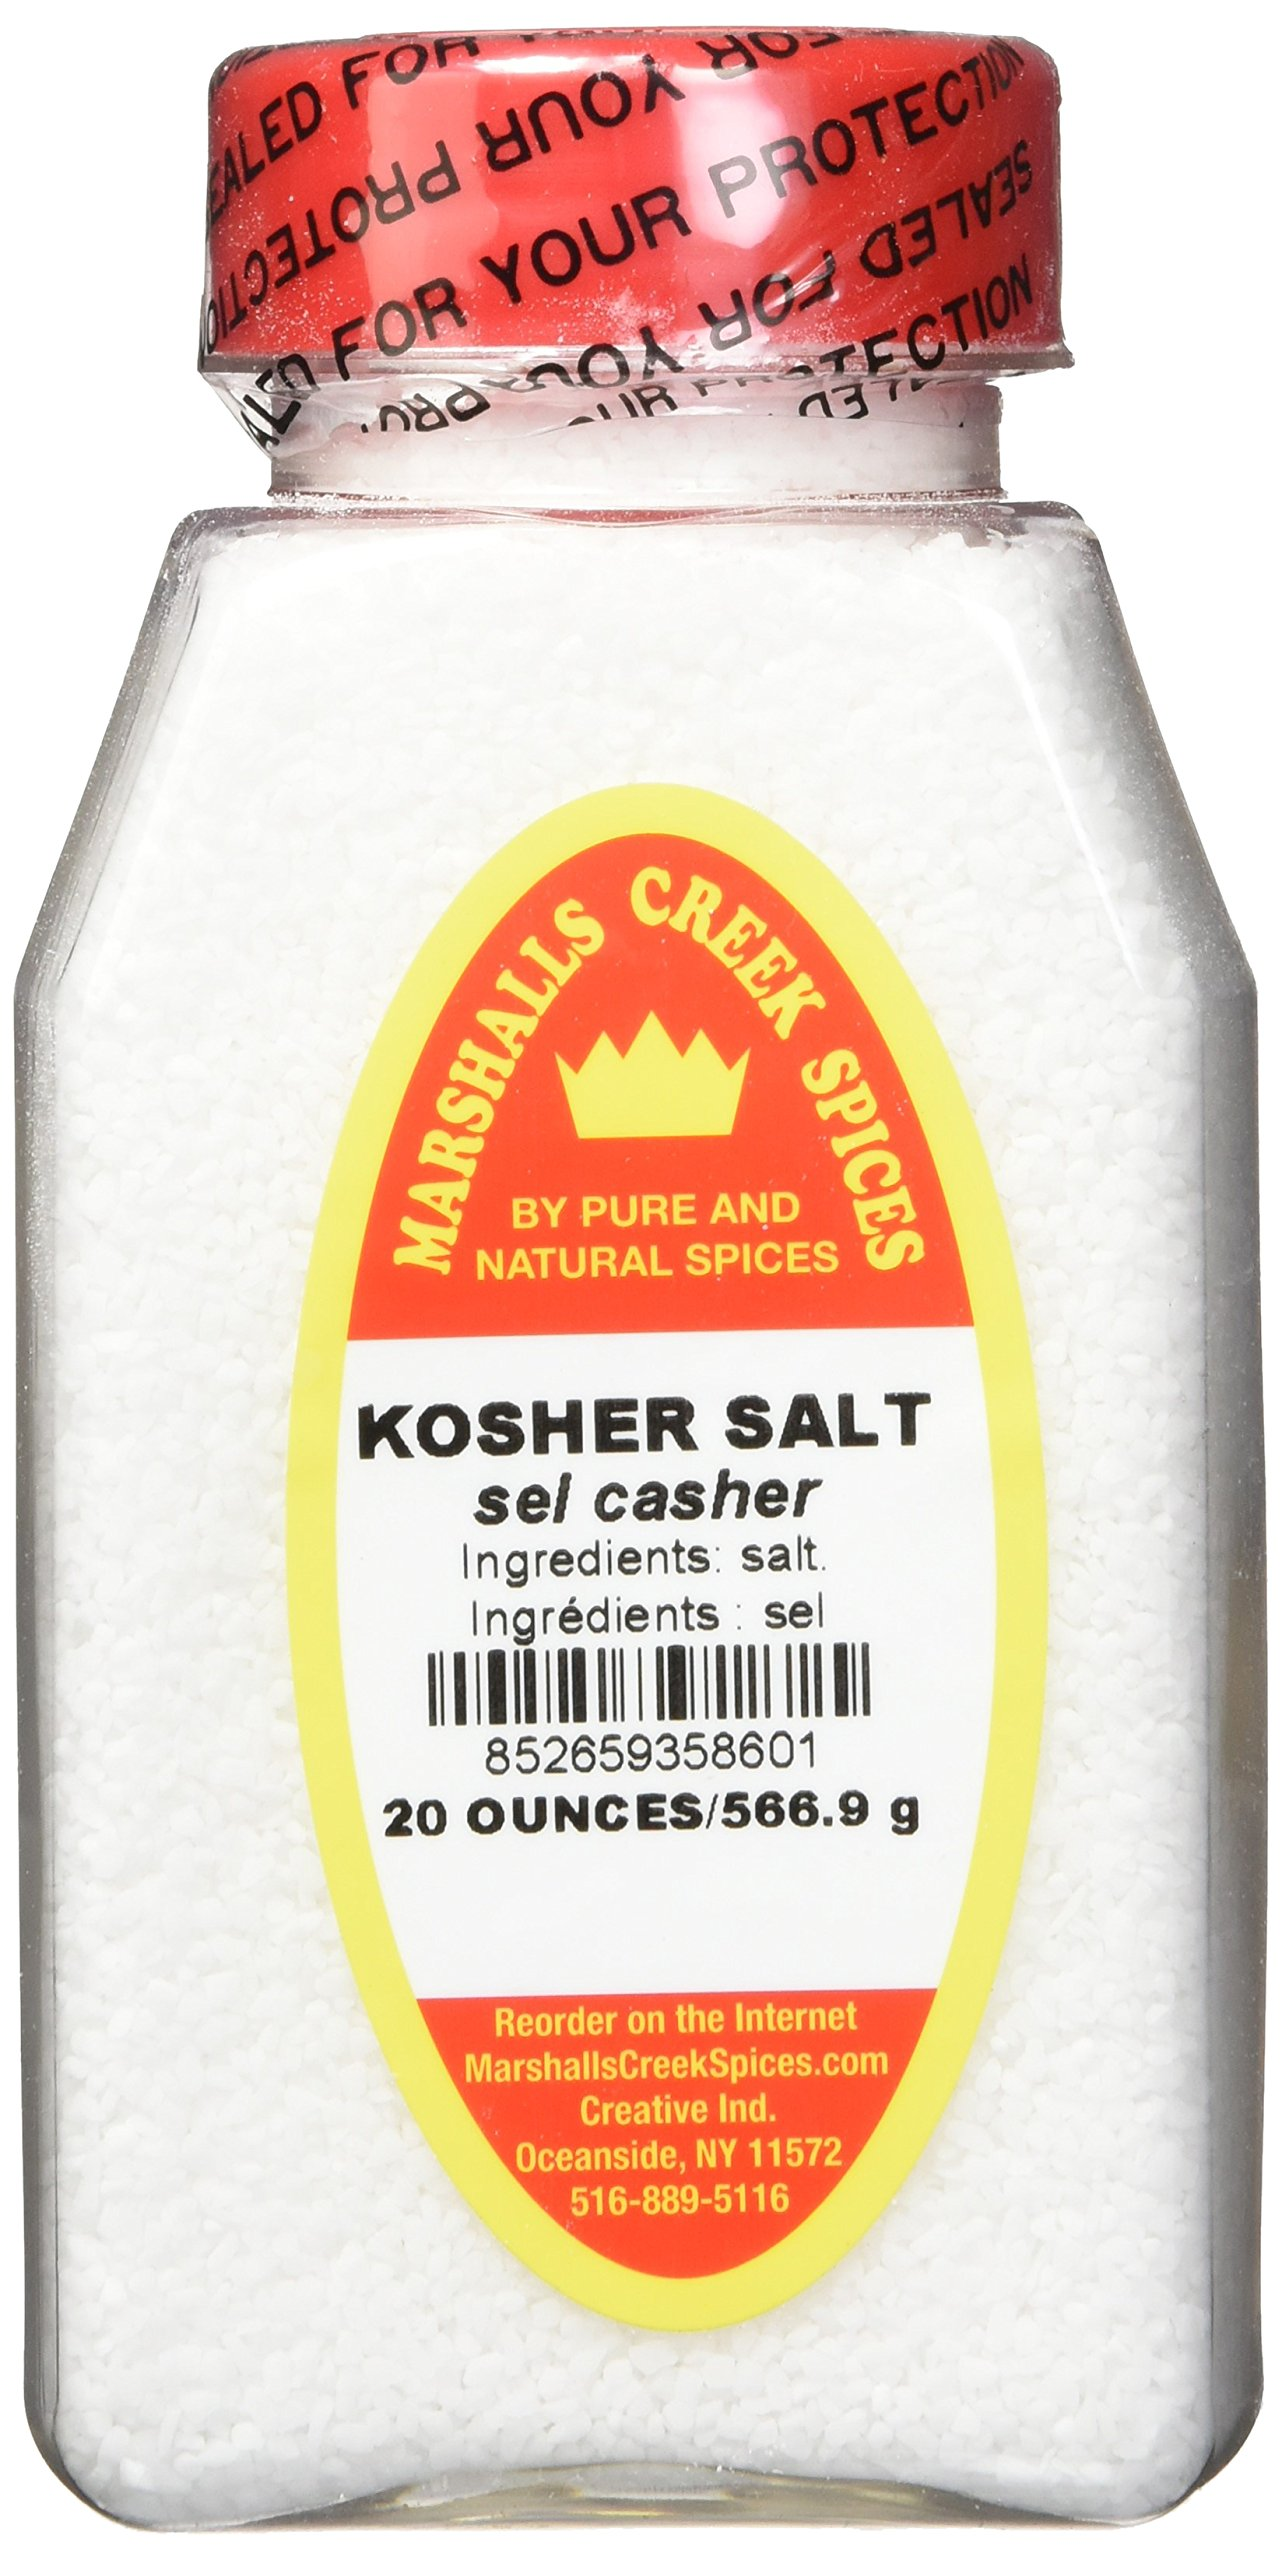 Marshalls Creek Spices Kosher Salt Freshly Packed in Large Jars, 20 Ounce (Pack of 12)